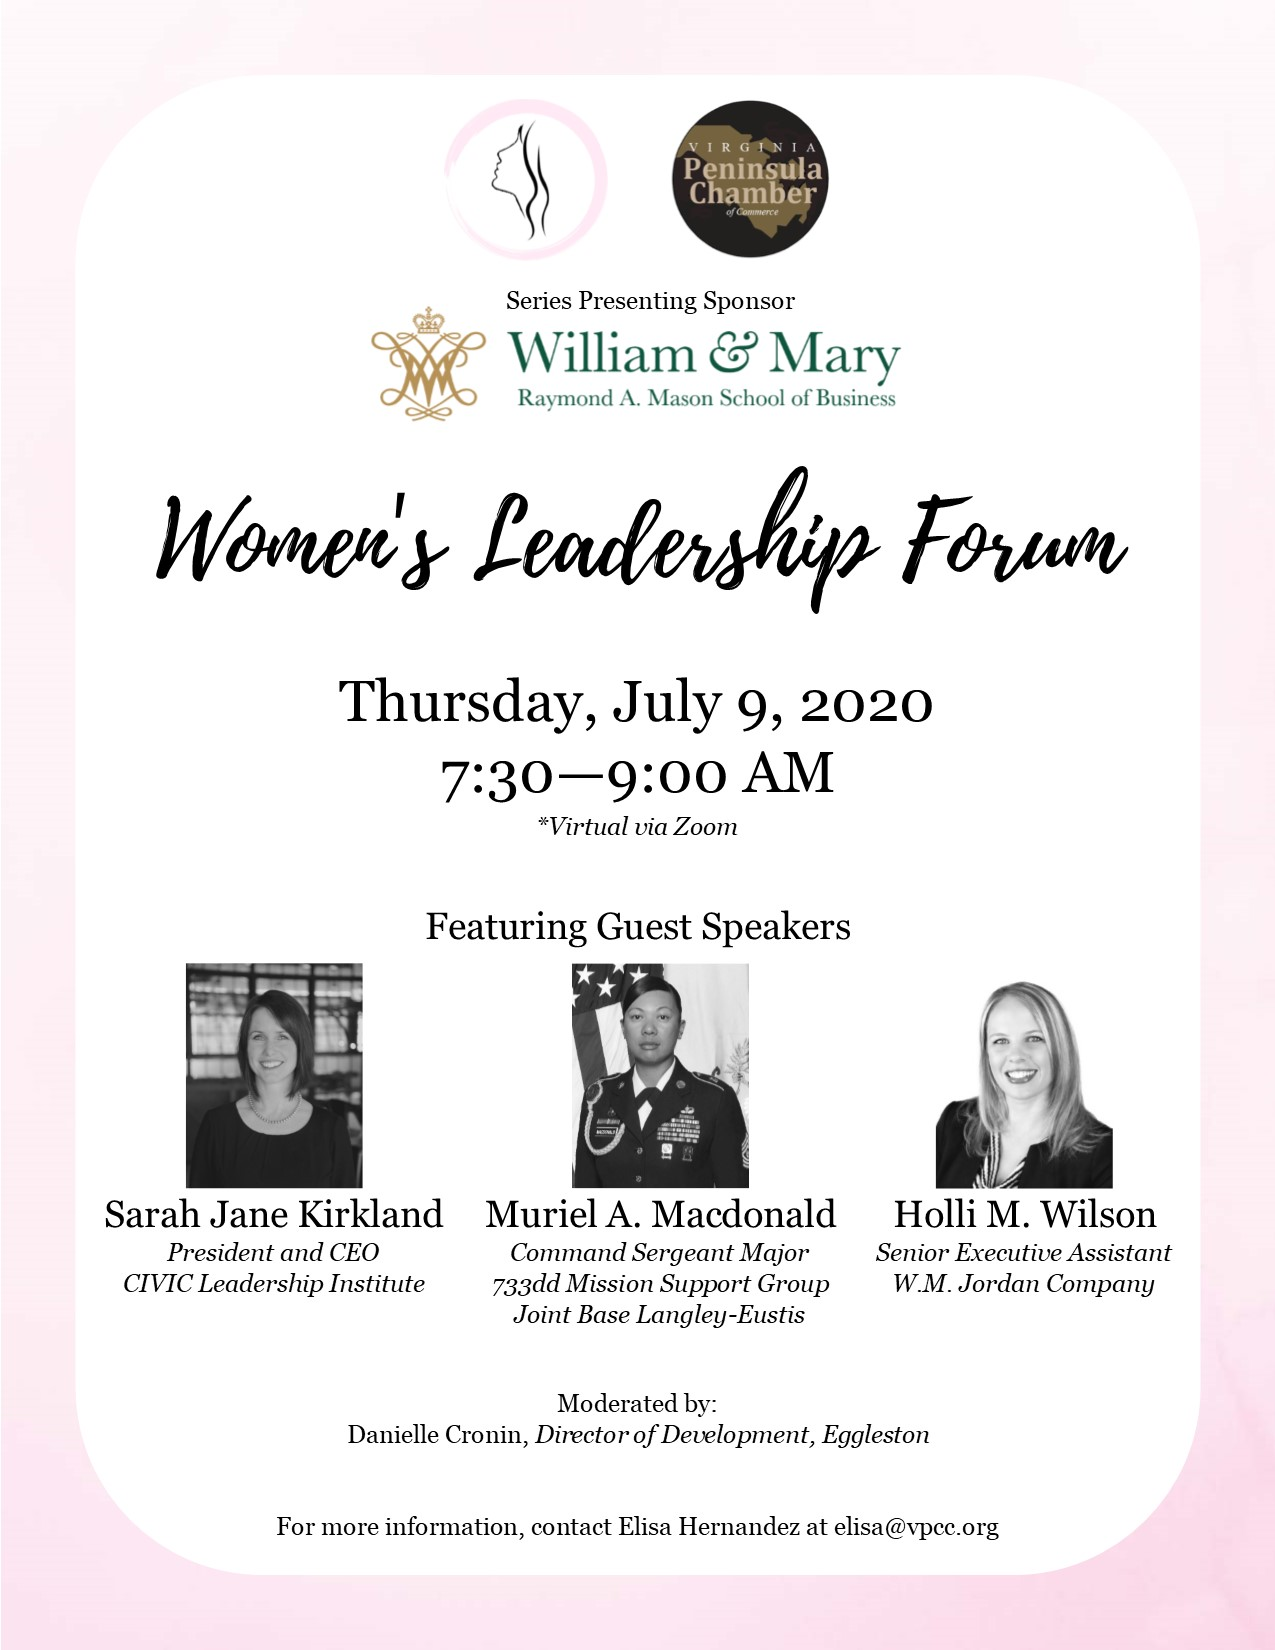 2017-0502-Women's-Leadership-Forum-(FLYER).jpg